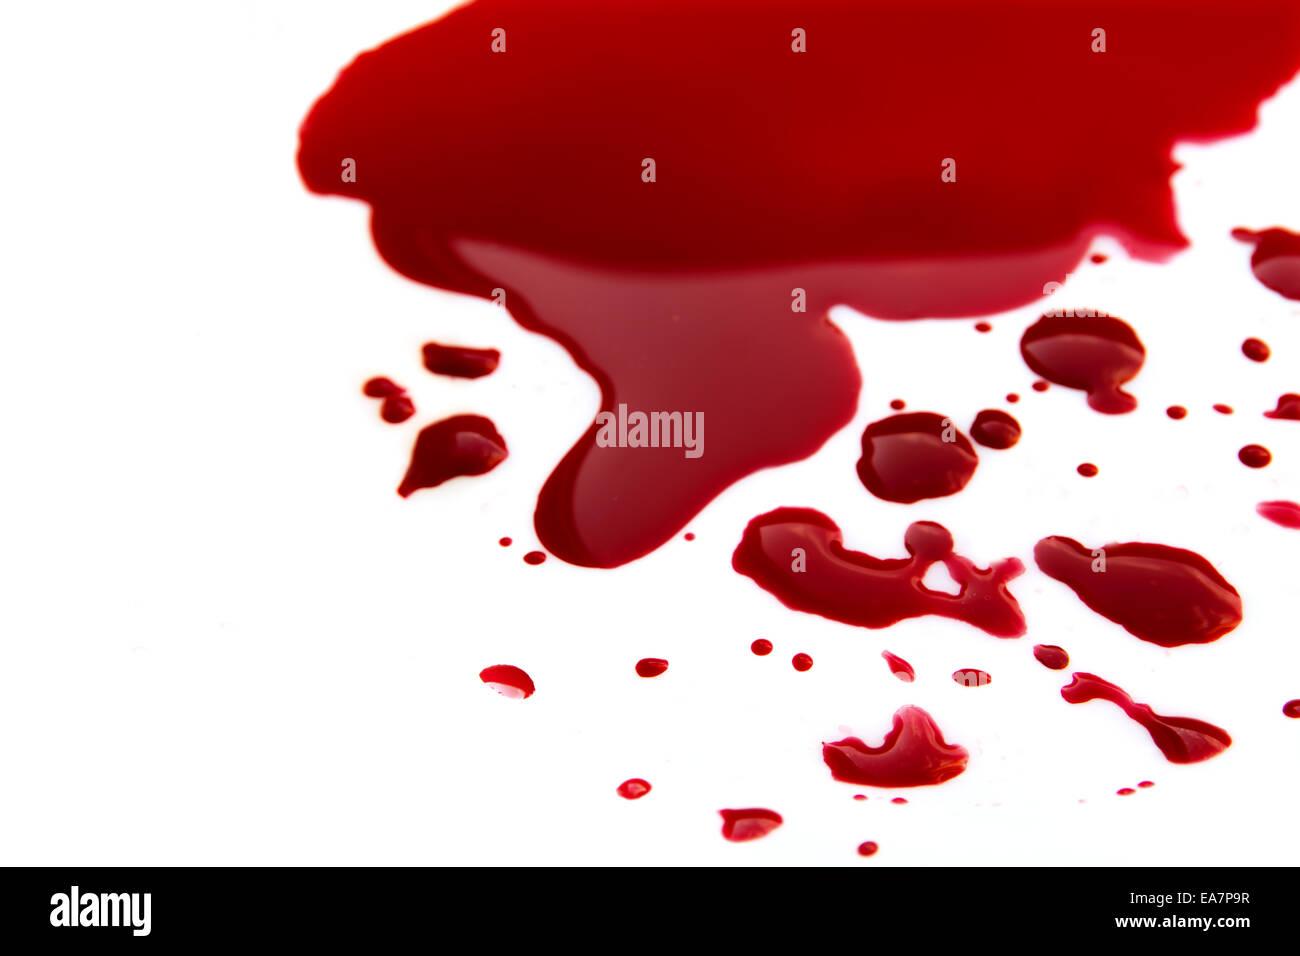 Blood stains (puddle) isolated on white background close up, horizontal - Stock Image